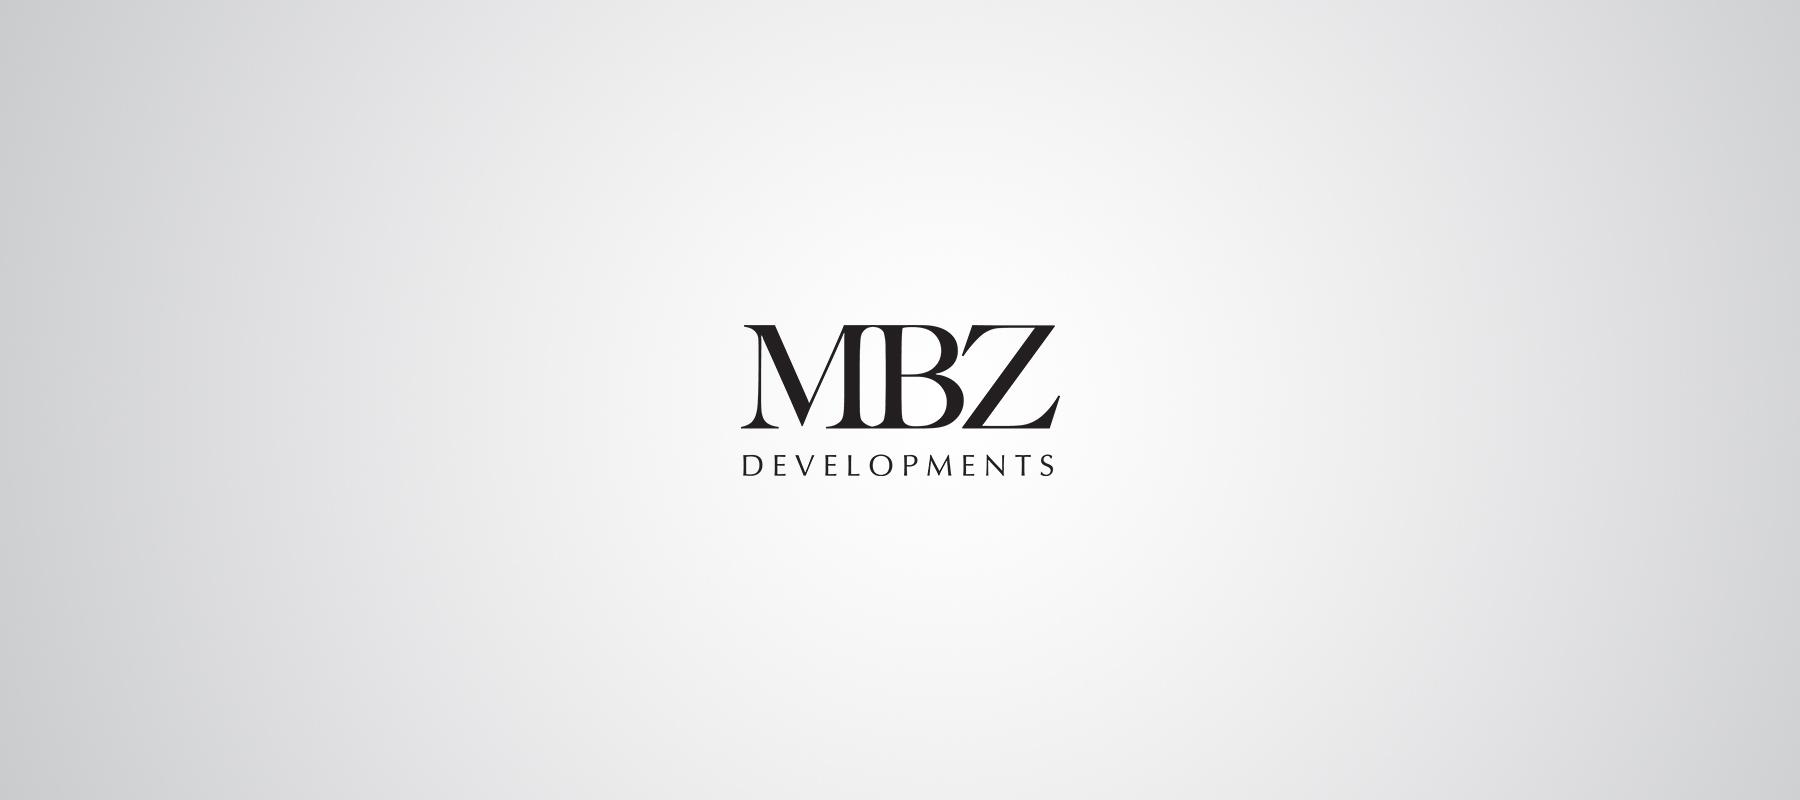 CR_Logo_MBZ_1800x800_work.jpg